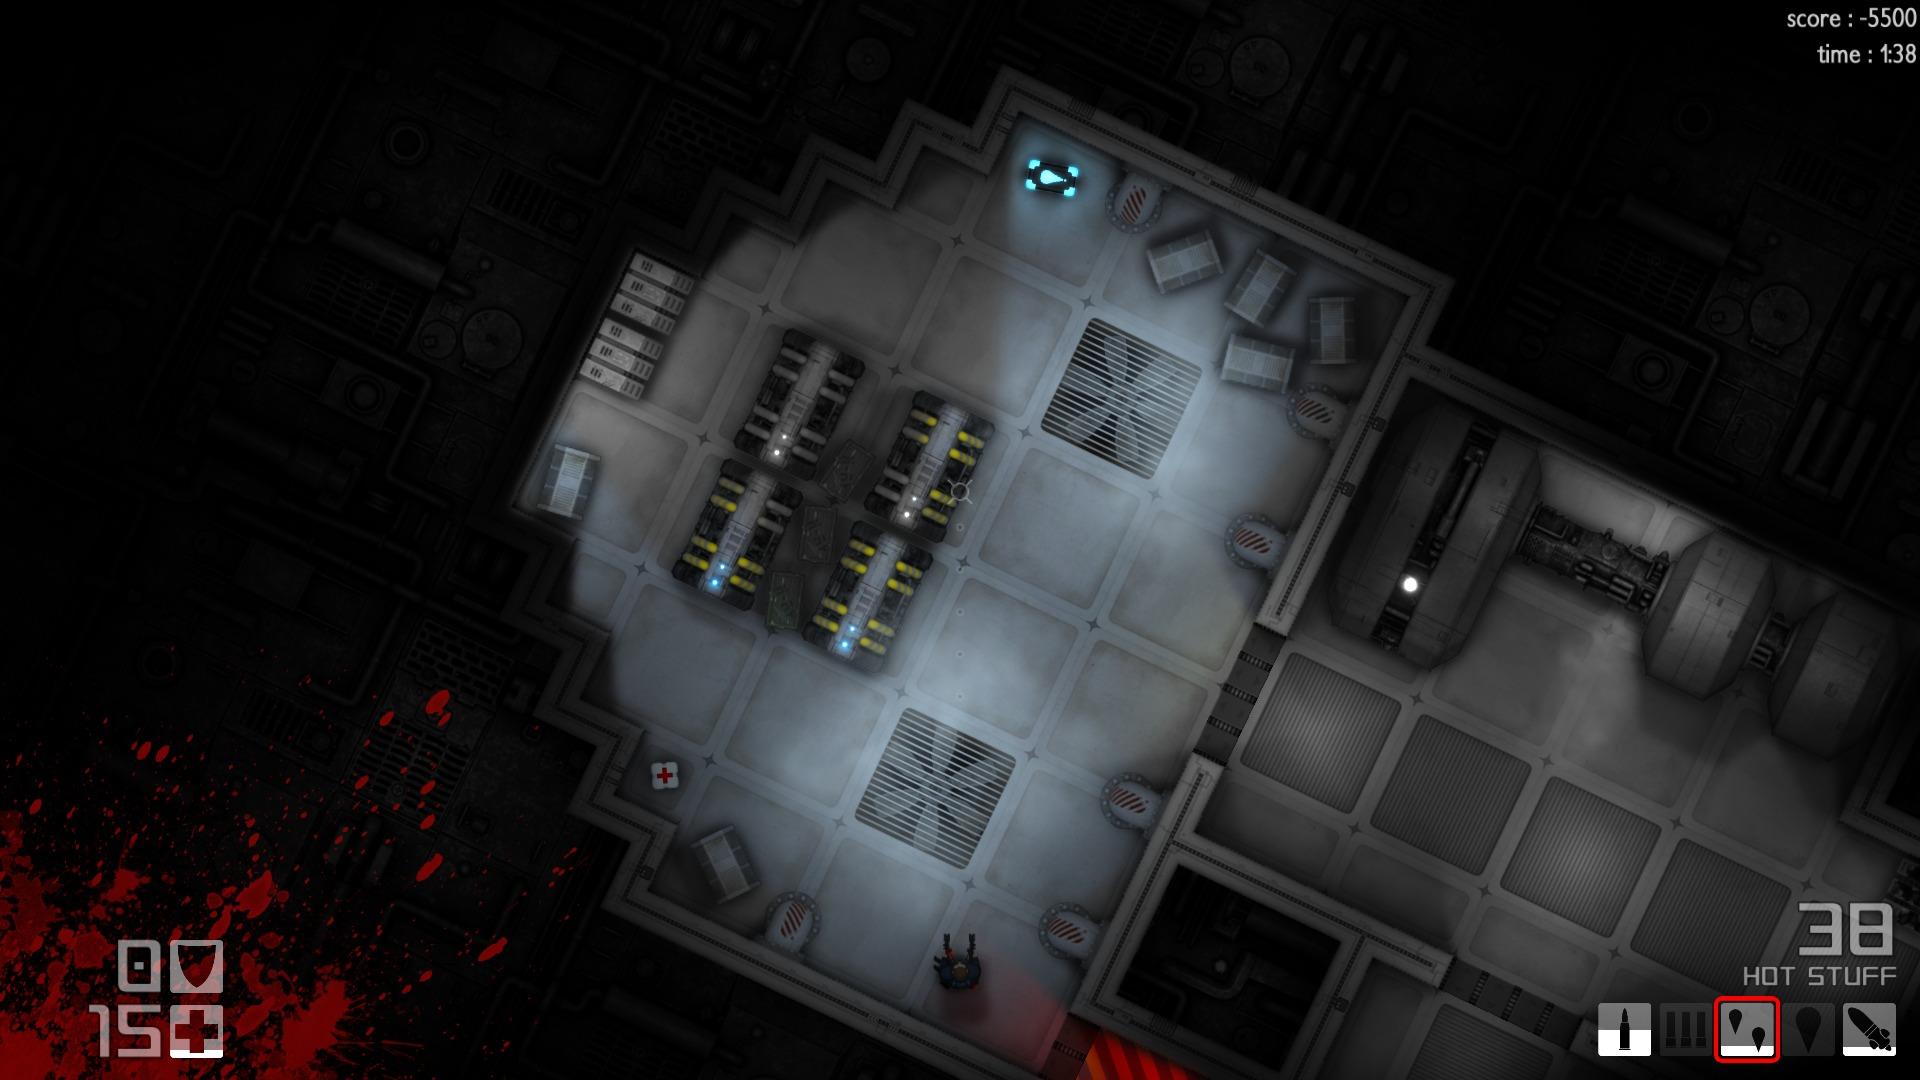 IMAGE(http://daedalus-thegame.com/images/screenshots/blood_indicator.jpg)